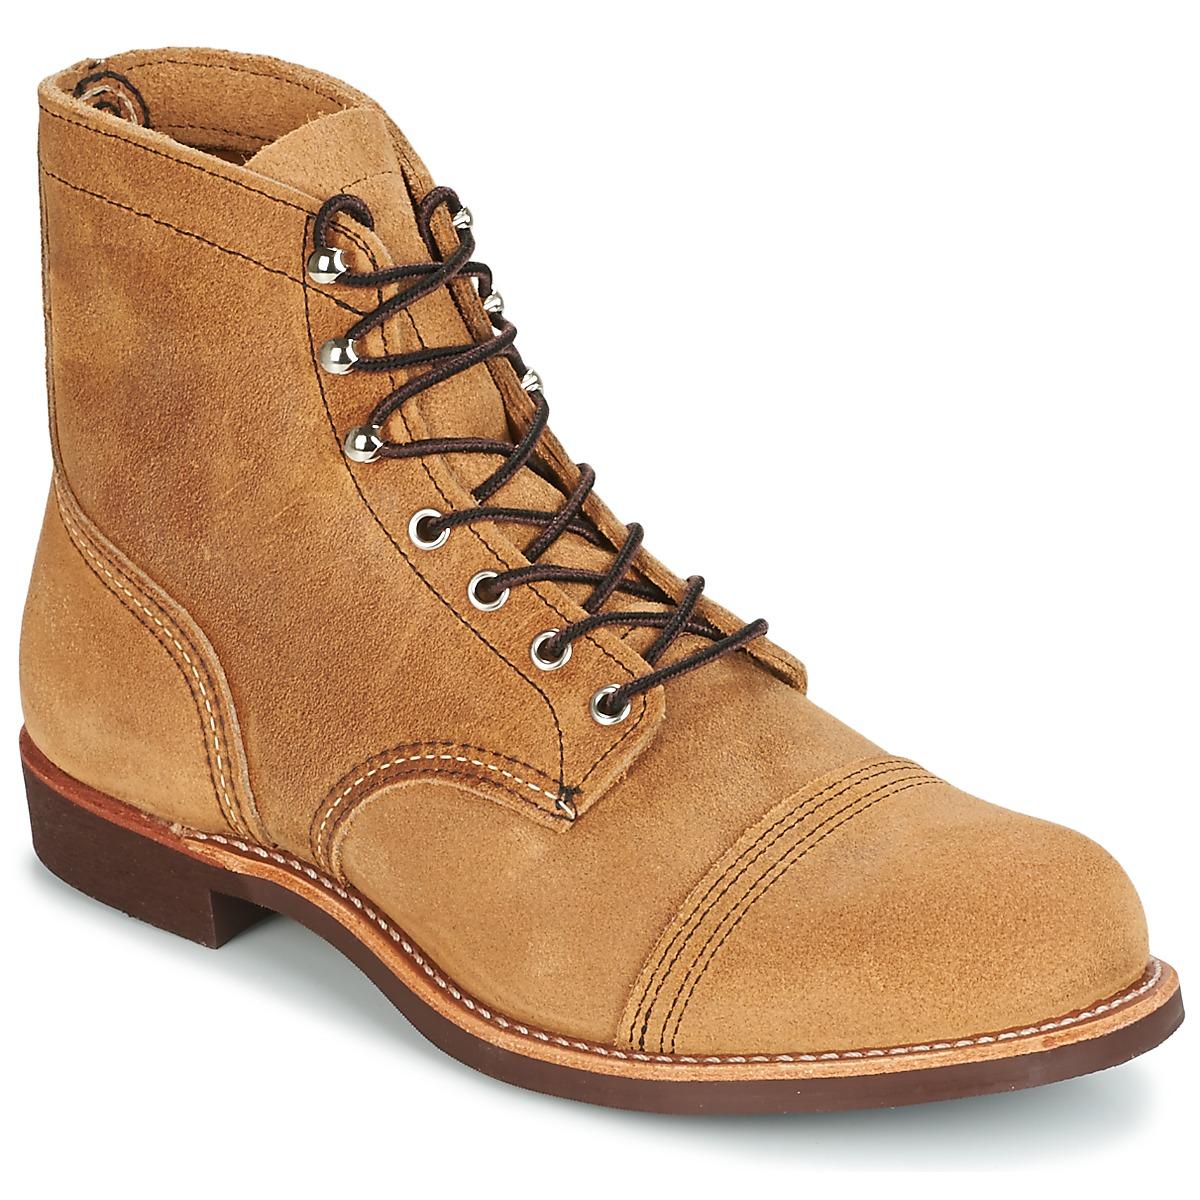 Red Wing IRON RANGER Camel - Kostenloser Versand bei Spartoode ! - Schuhe Boots Herren 319,00 €